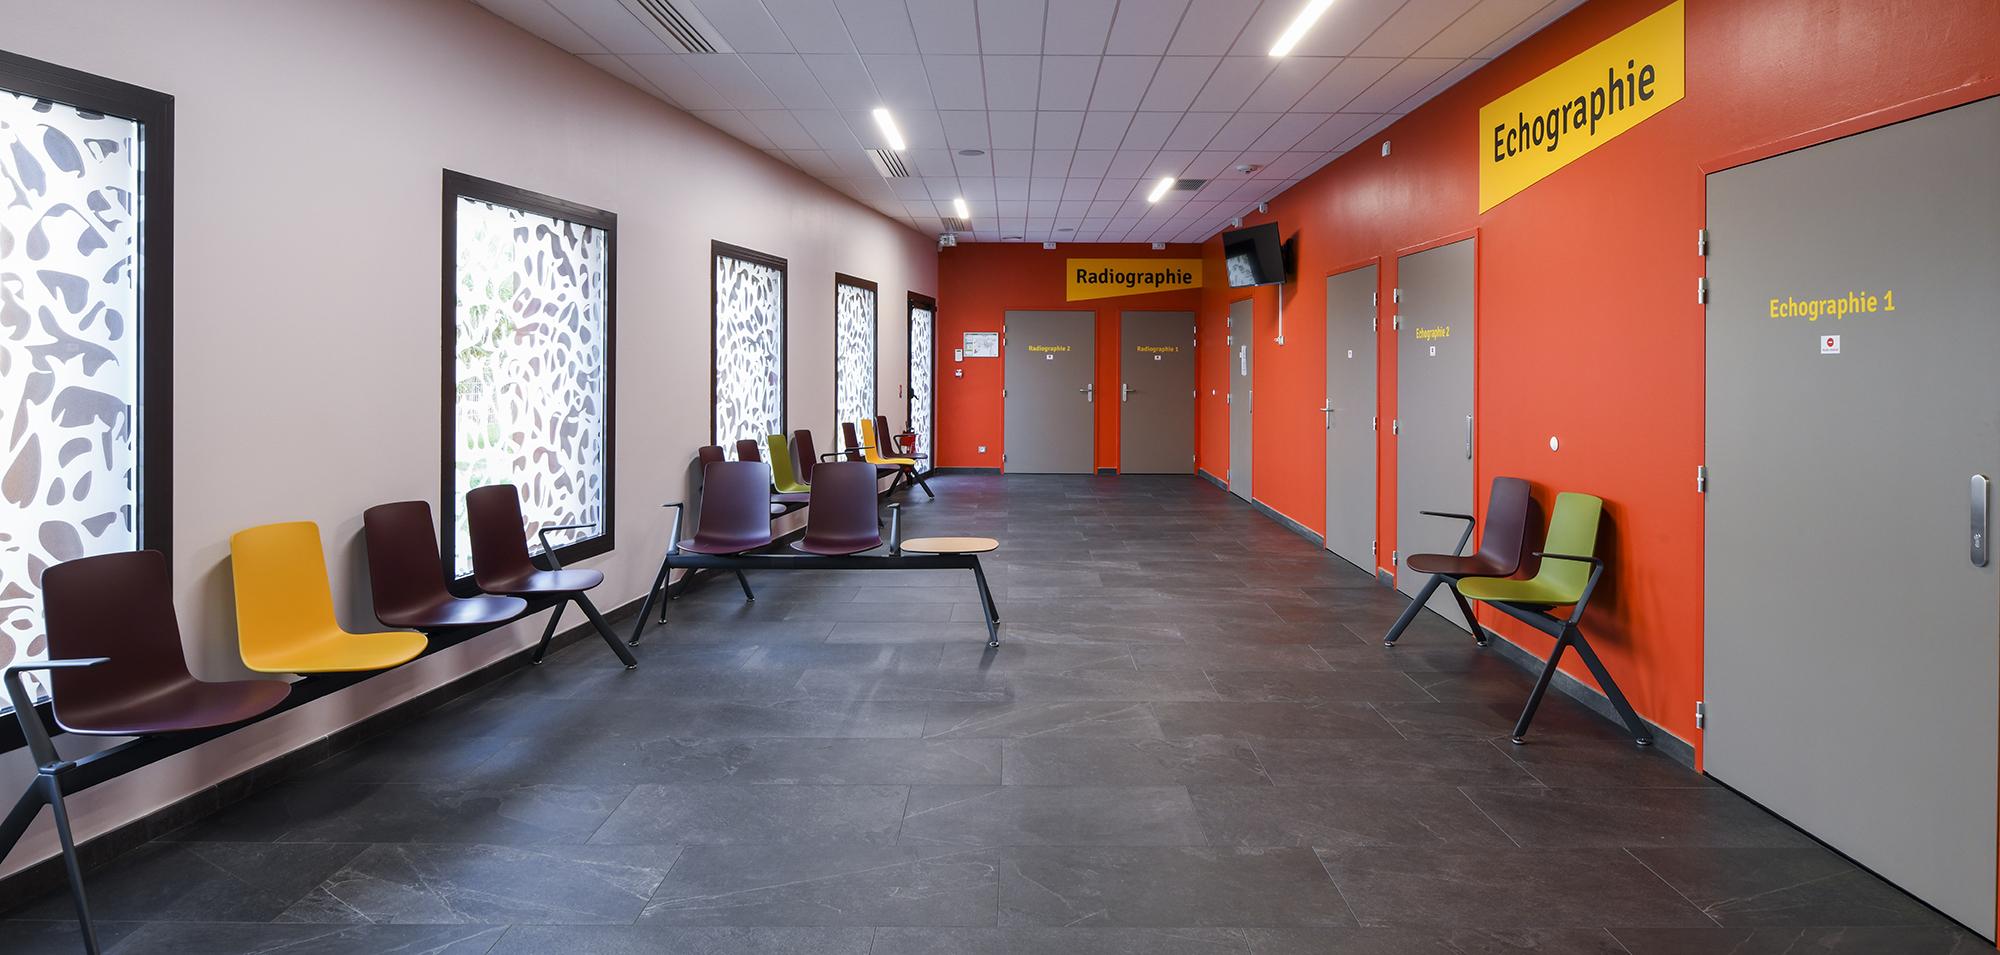 CENTRE DE L'ARTHROSE BORDEAUX MERIGNAC S